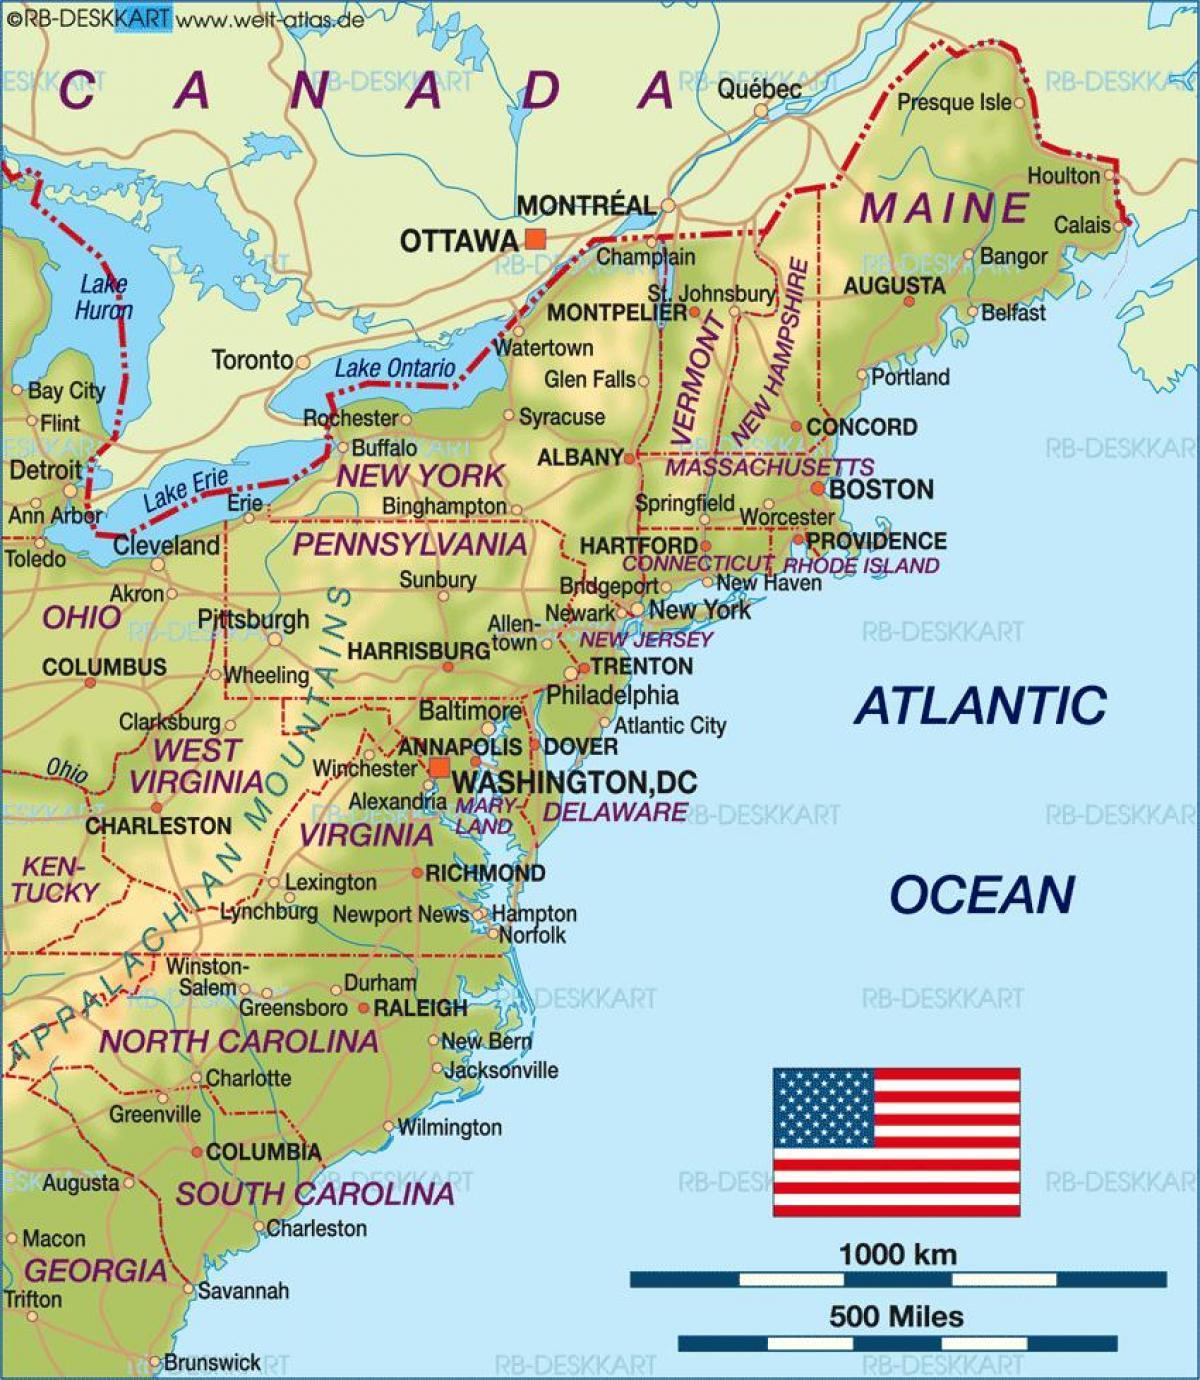 Boston Cartina Stati Uniti.Boston Usa Mappa Boston Su Una Mappa Degli Stati Uniti Stati Uniti D America